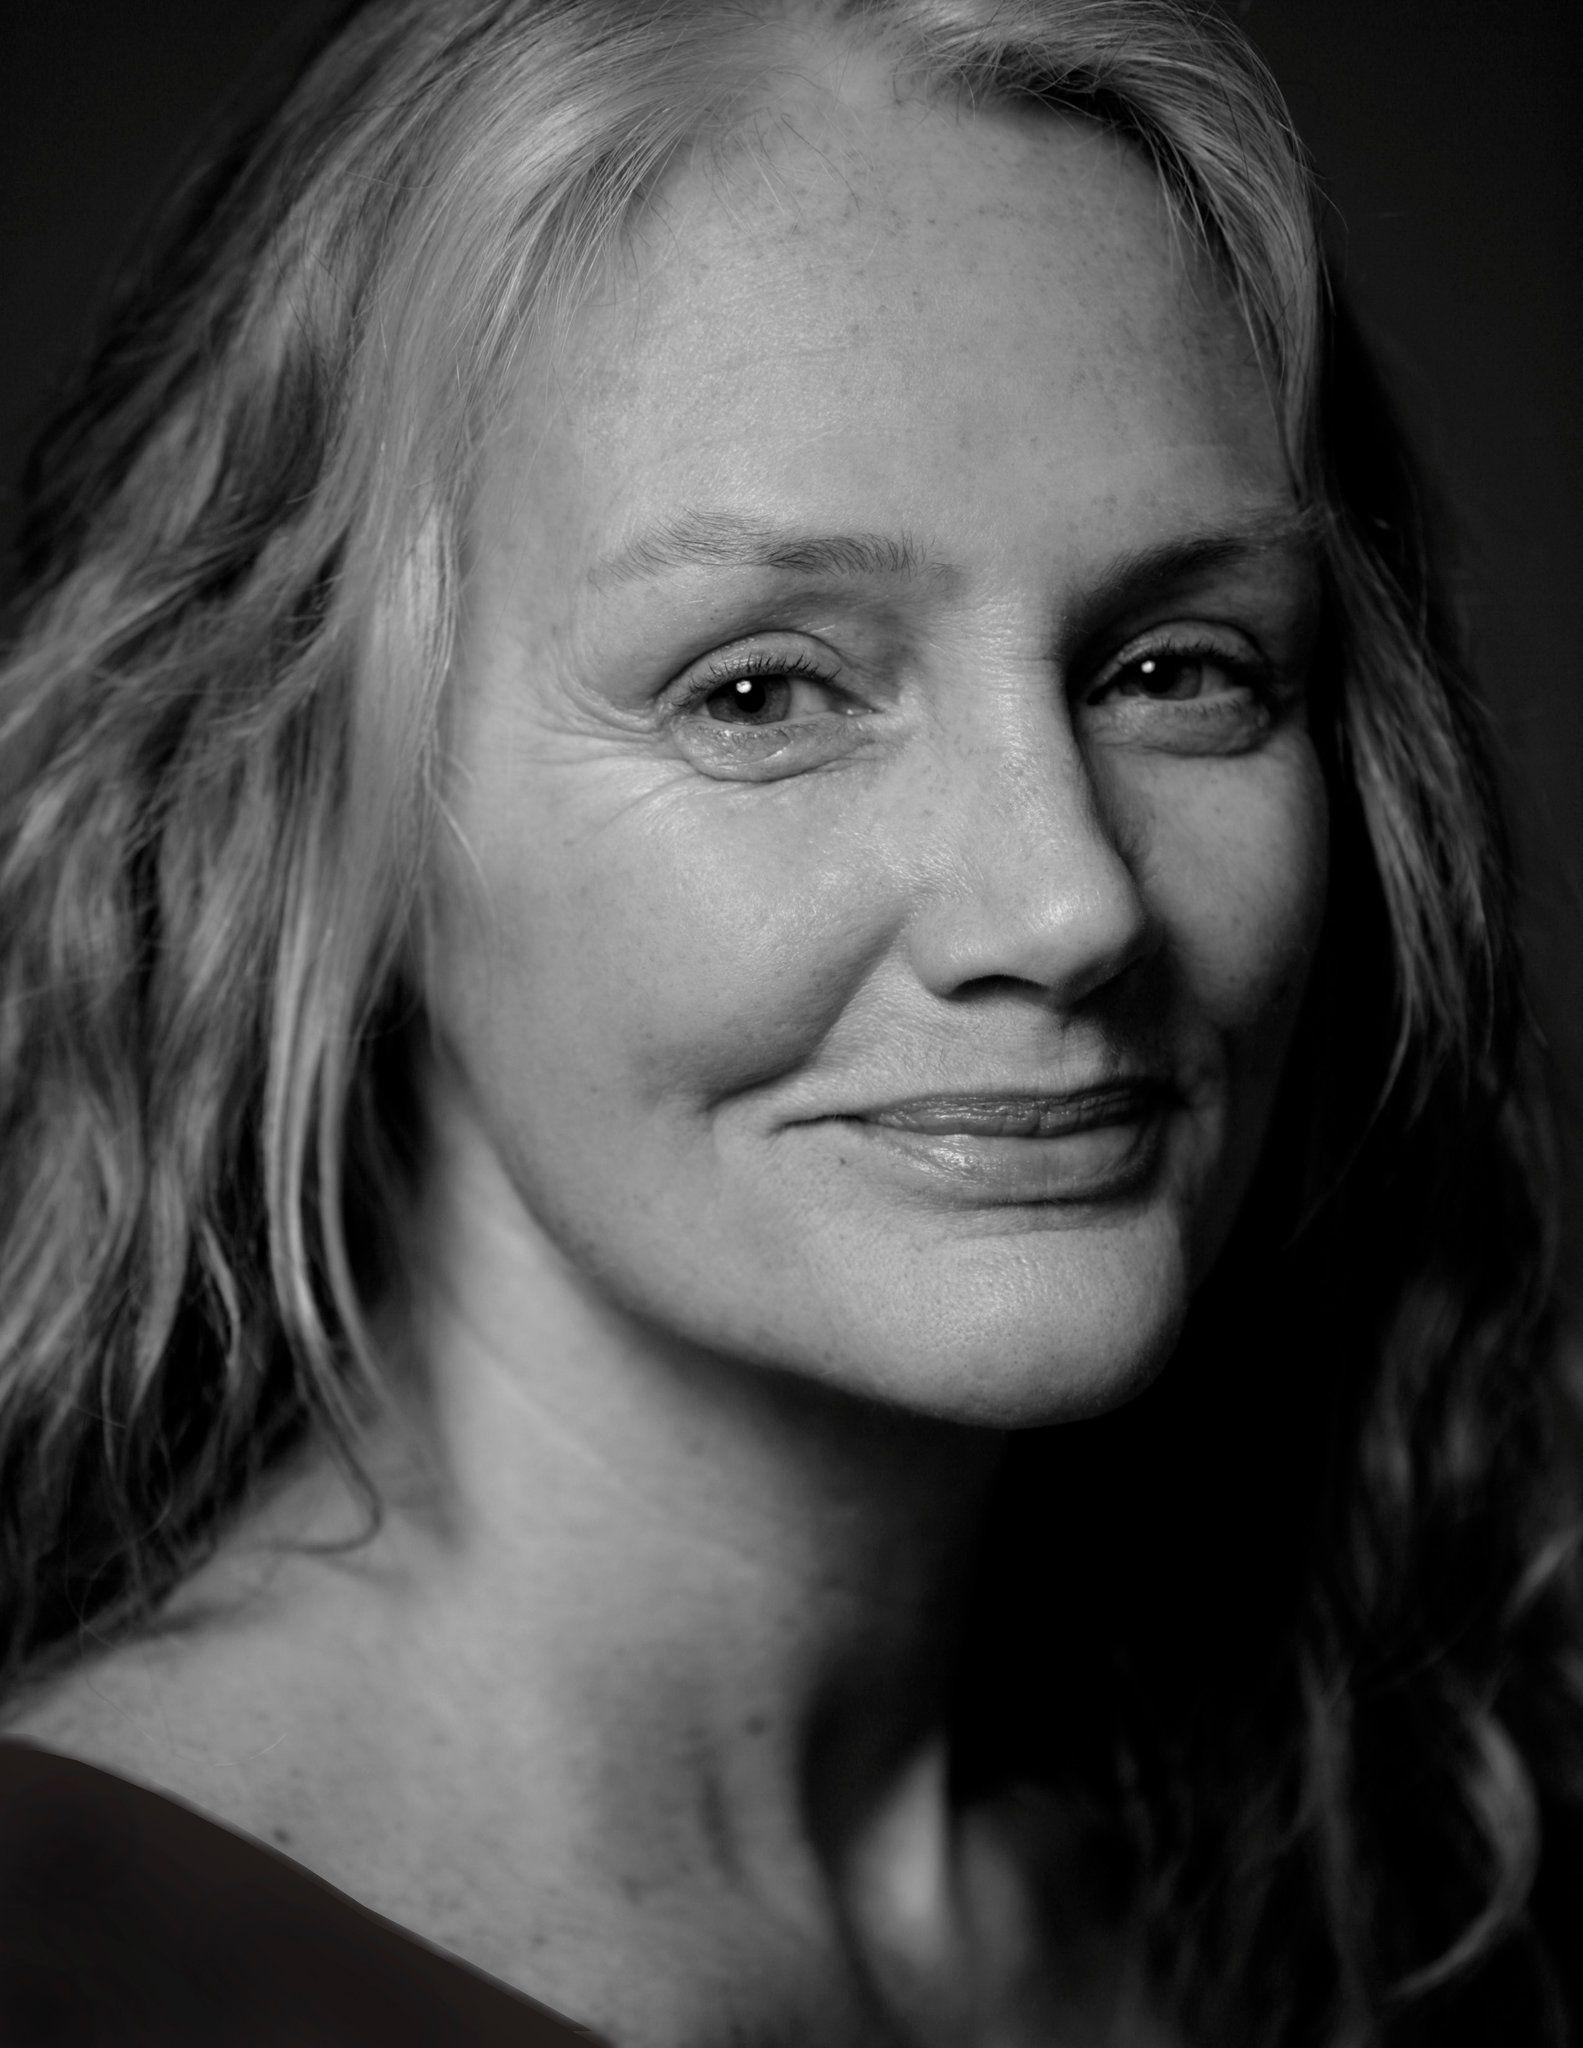 Mae Laborde Erotic clips Moana Pozzi,Lucy Griffiths (born 1986)